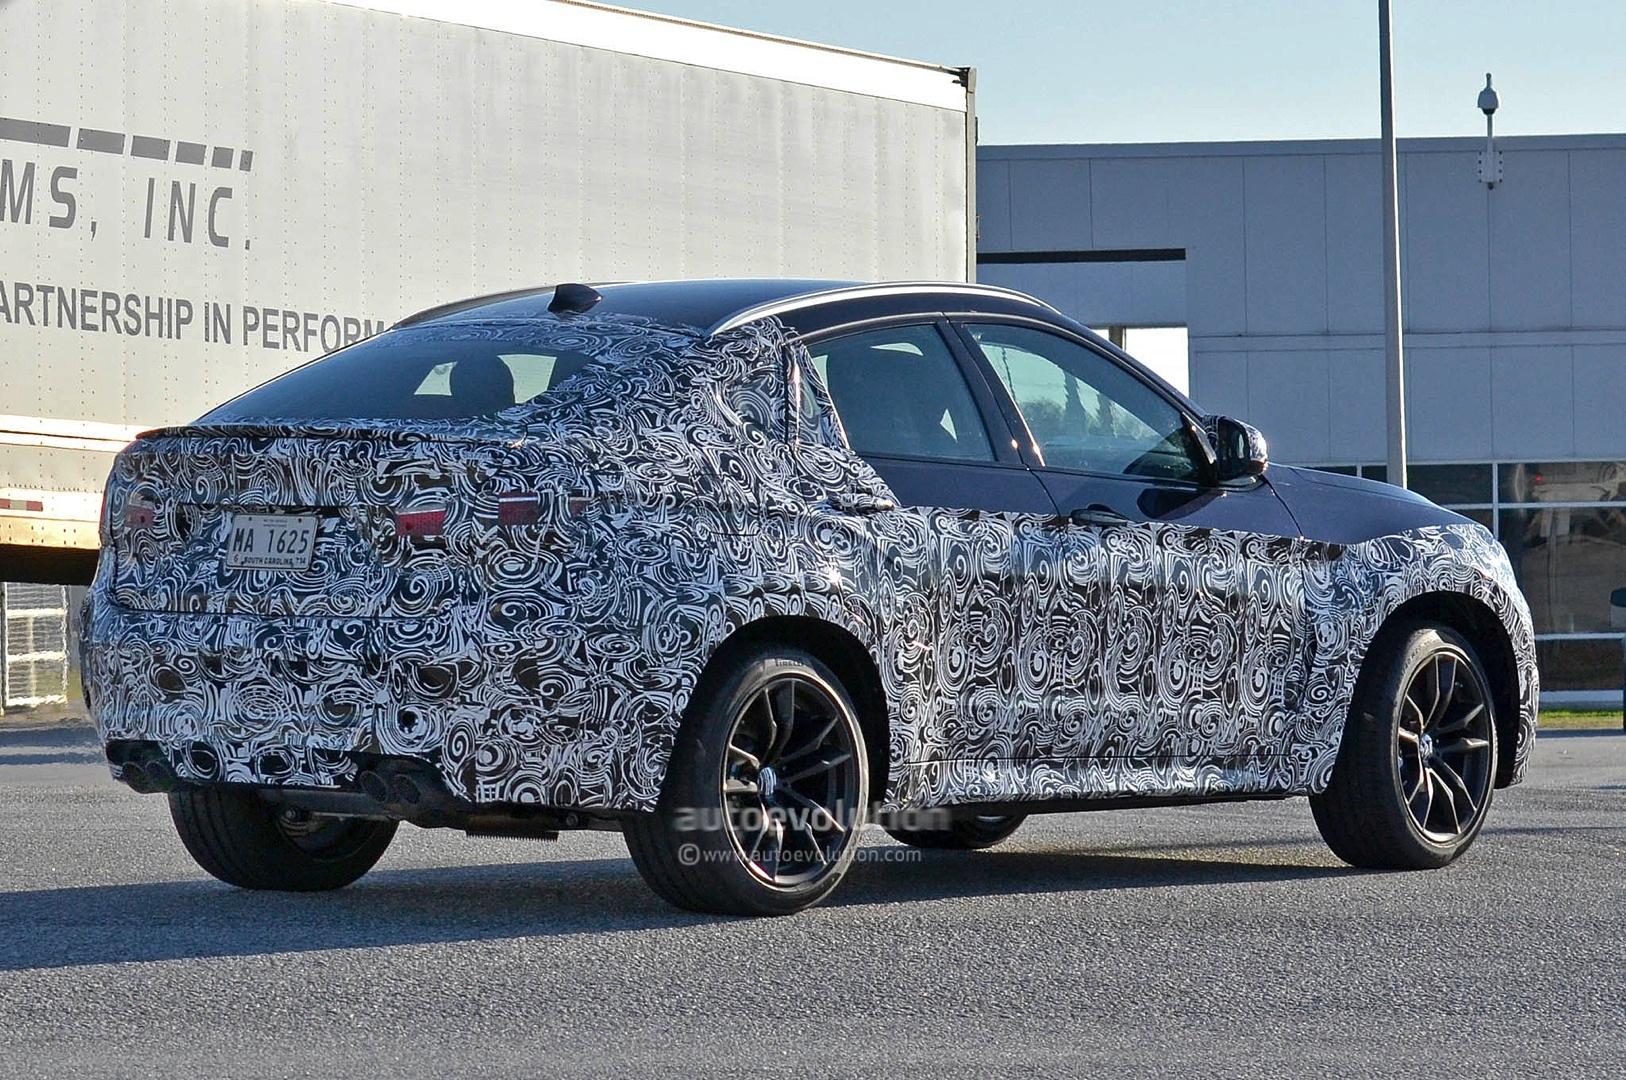 Spyshots 2016 Bmw X6 M Autoevolution